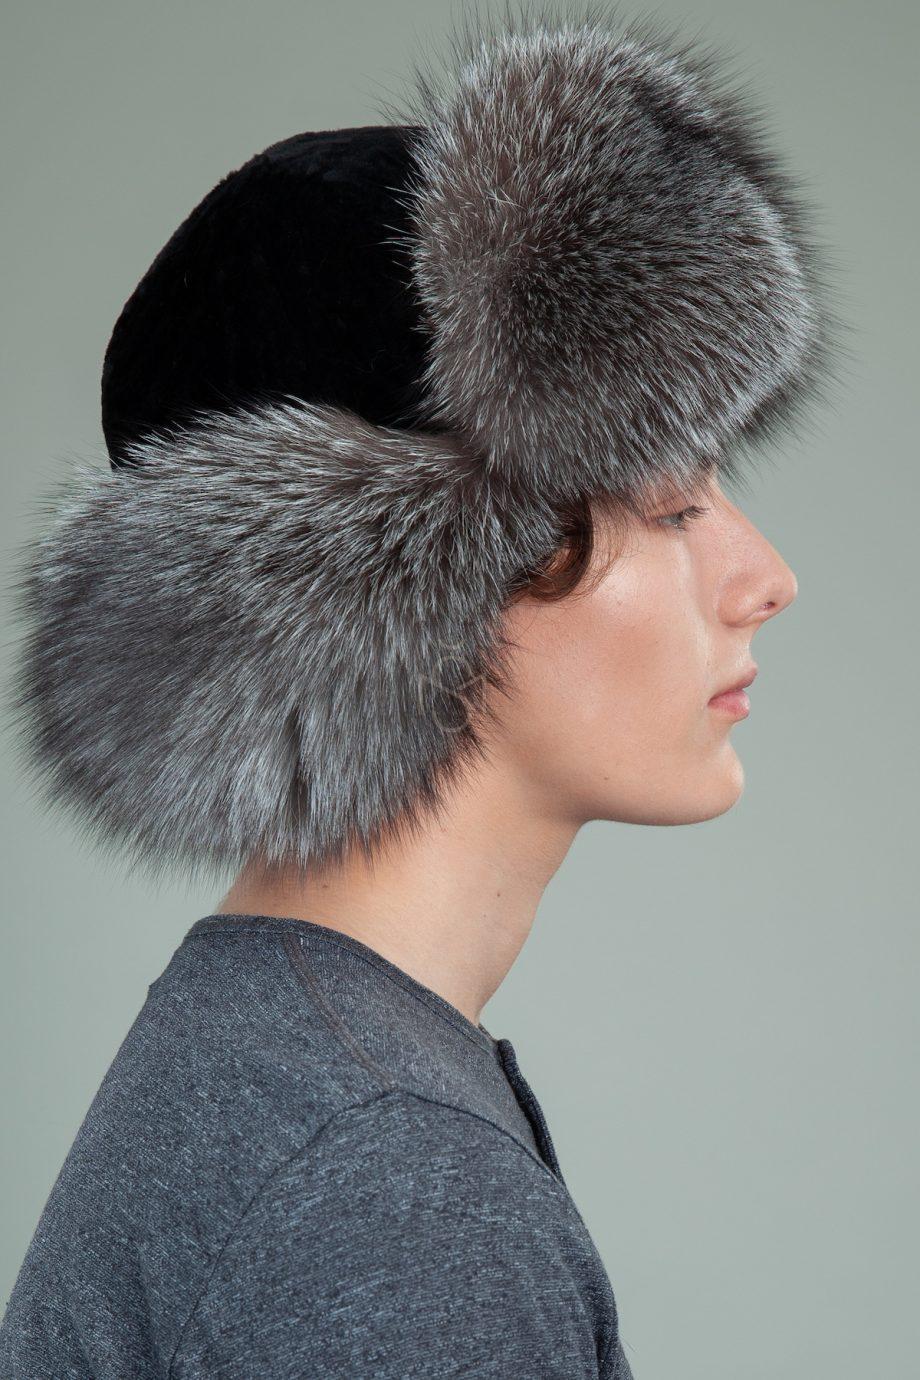 juodo avikailio ir juodsidabres lapes kepure su susegamomis ausimis